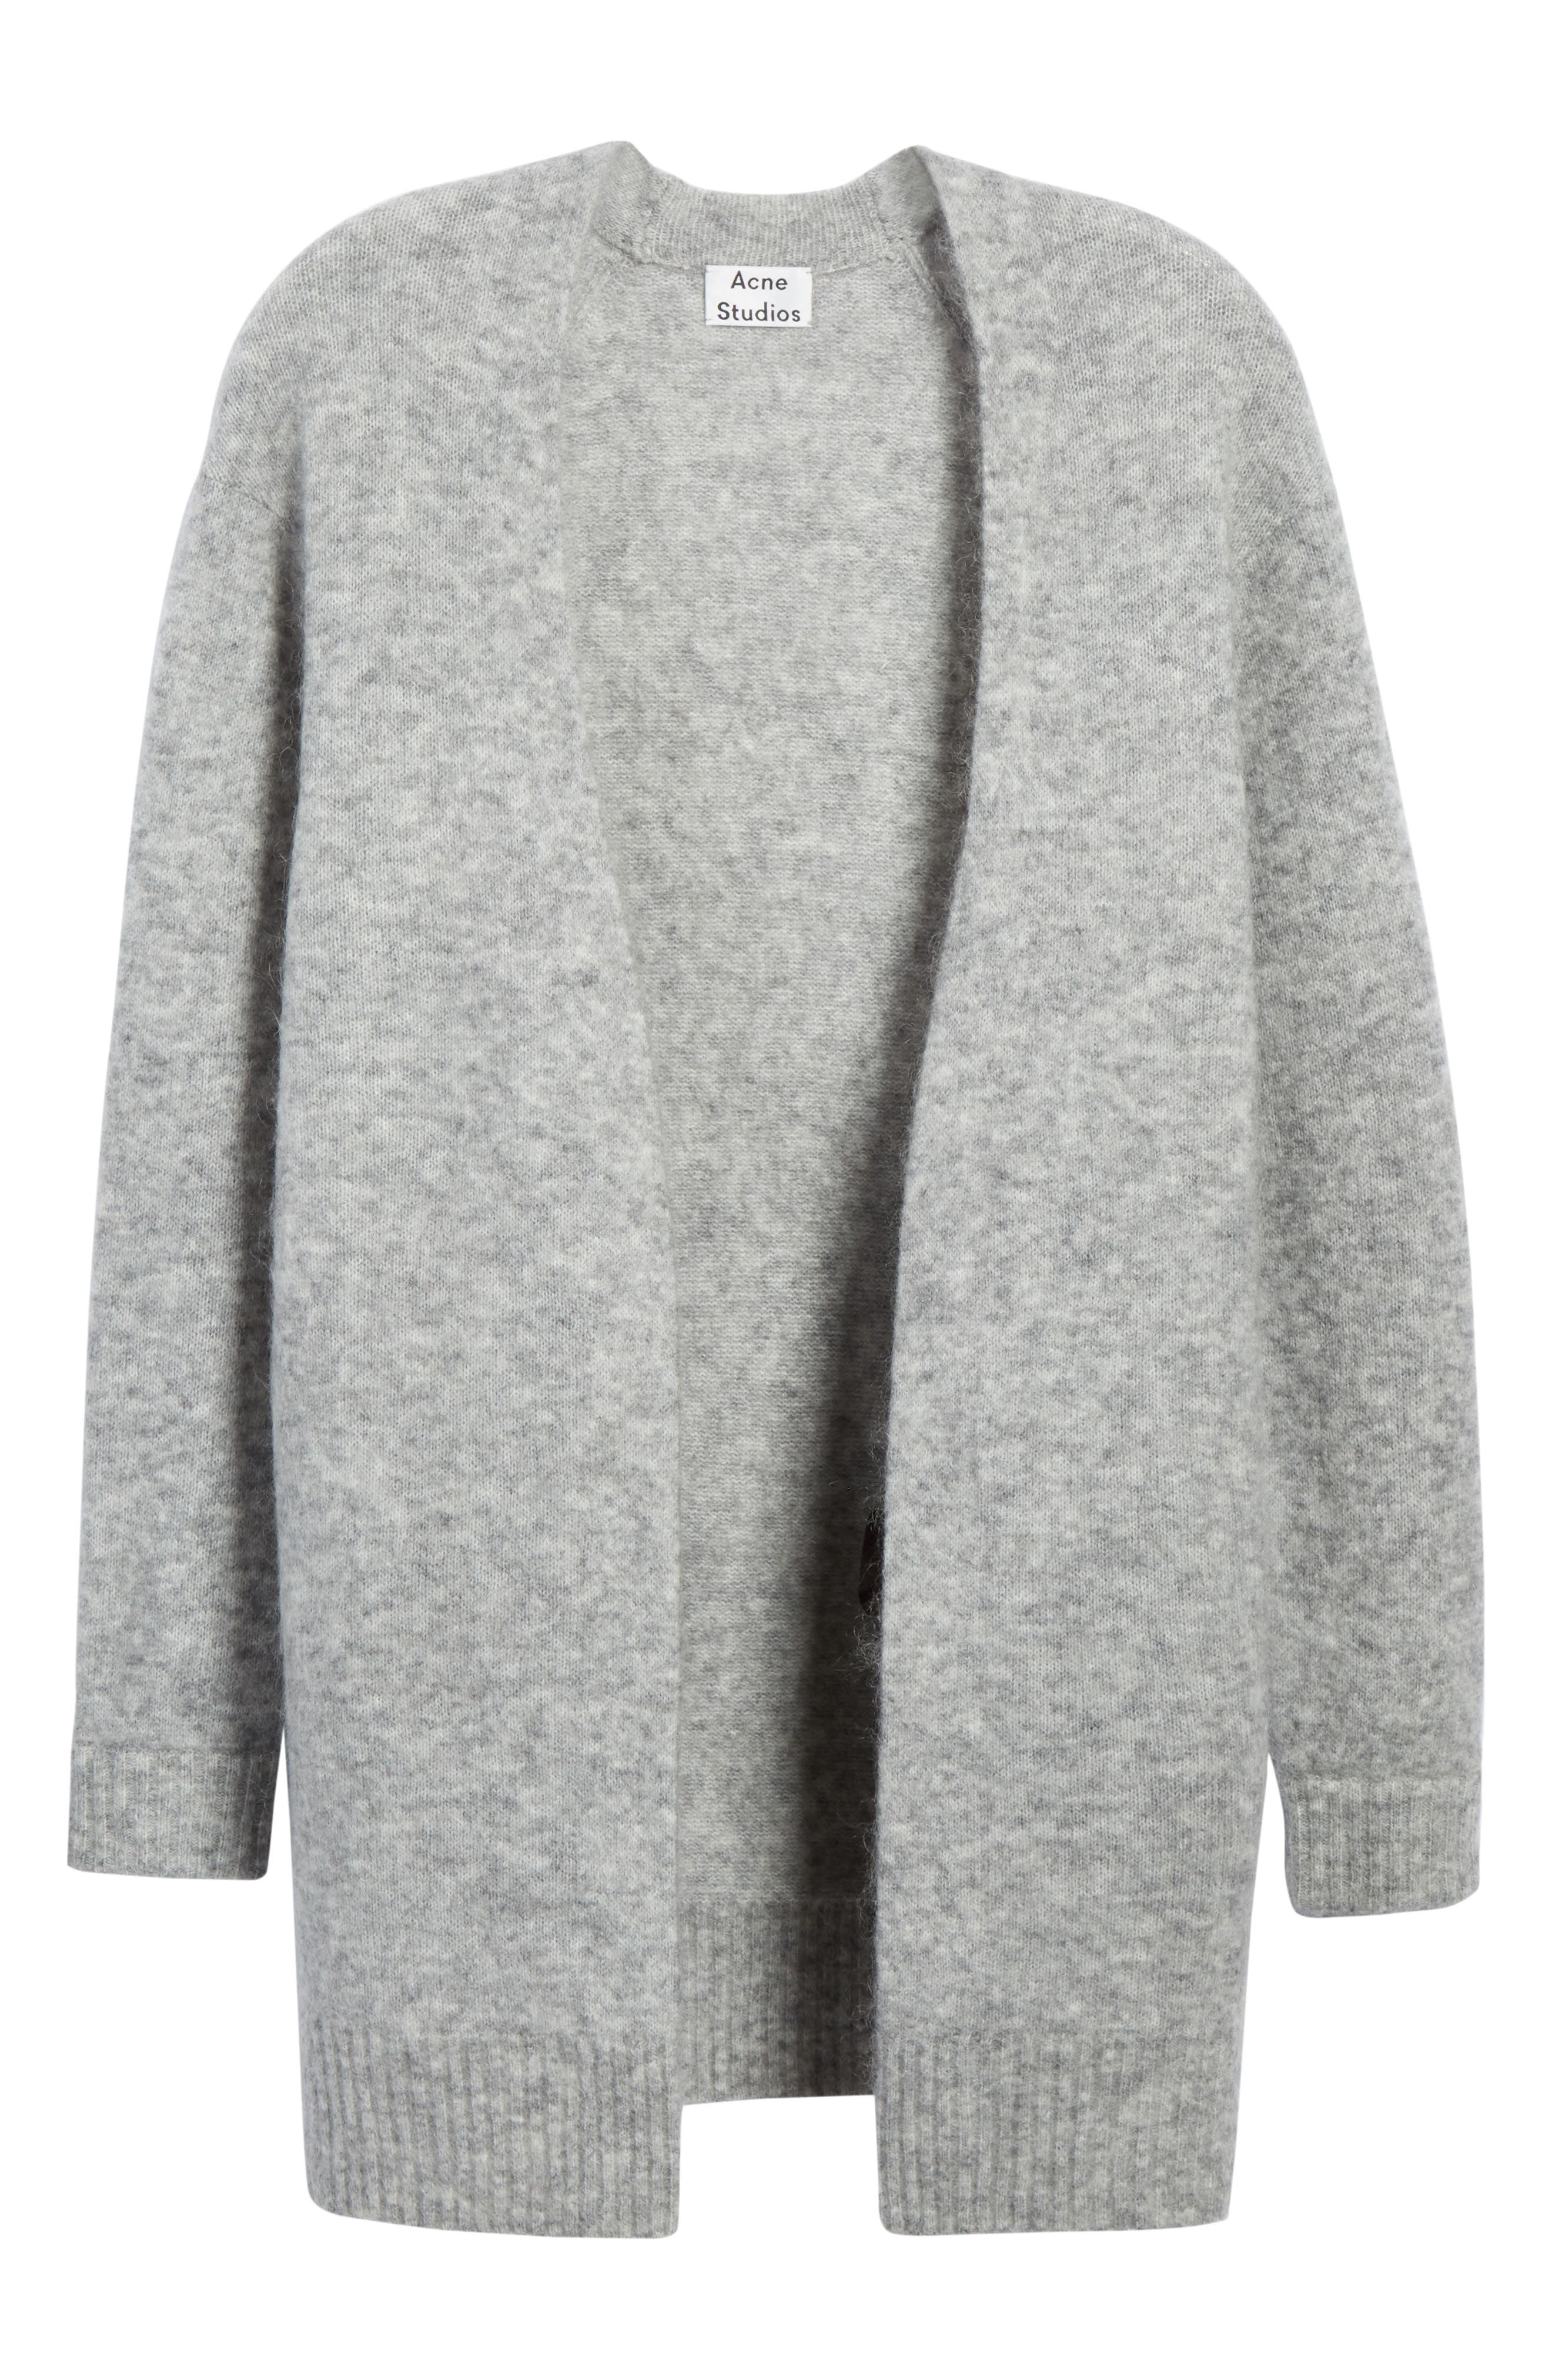 Raya Sh Mohair Knit Cardigan,                             Alternate thumbnail 6, color,                             Husky Grey